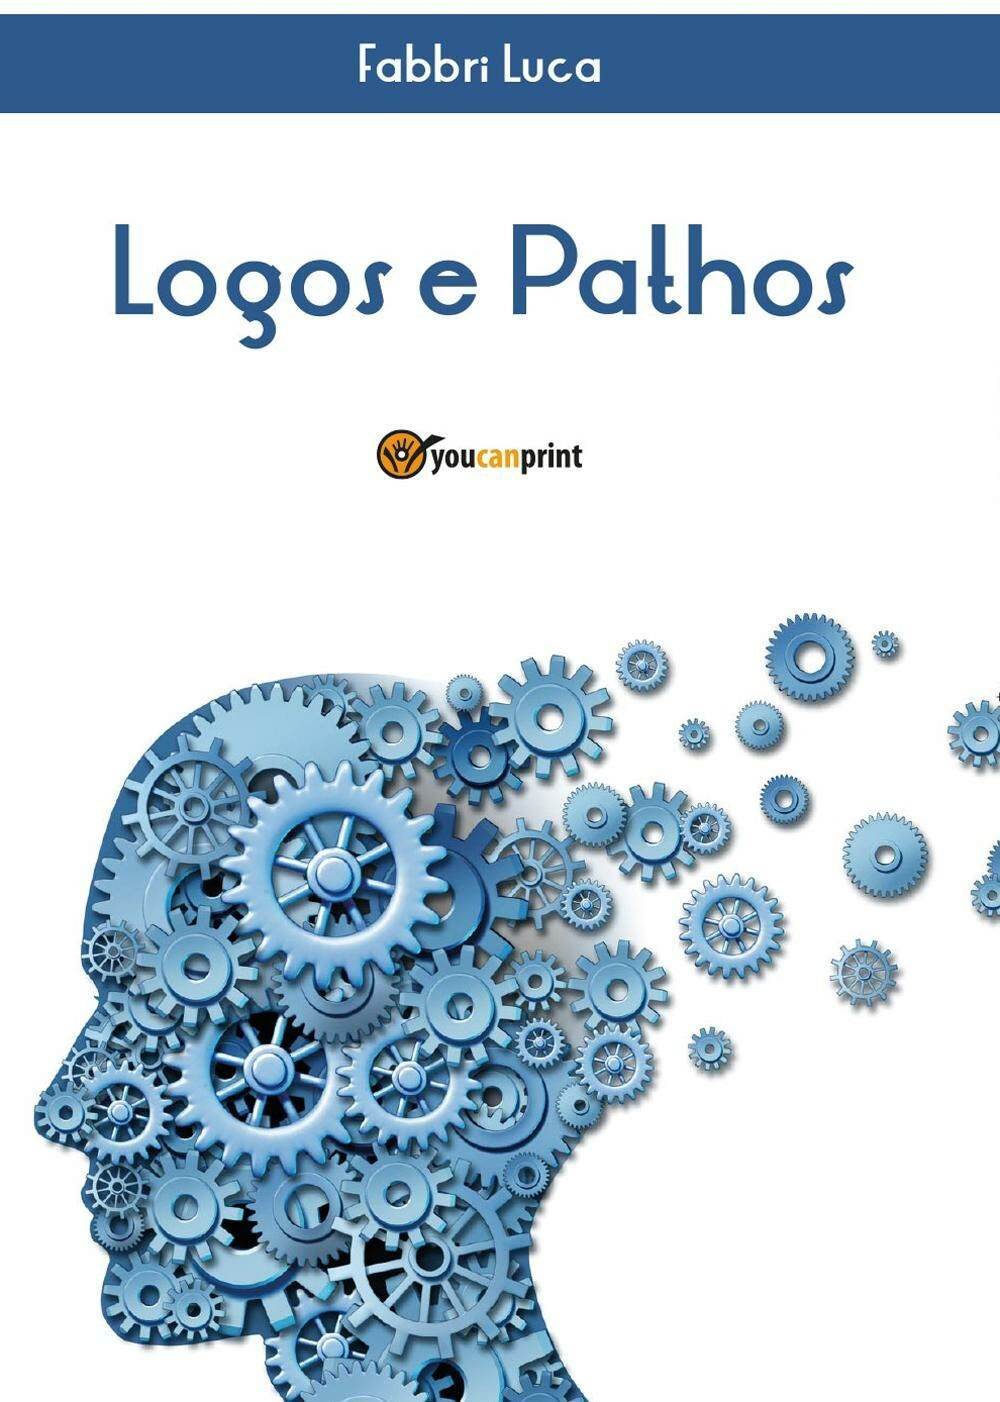 Logos e pathos